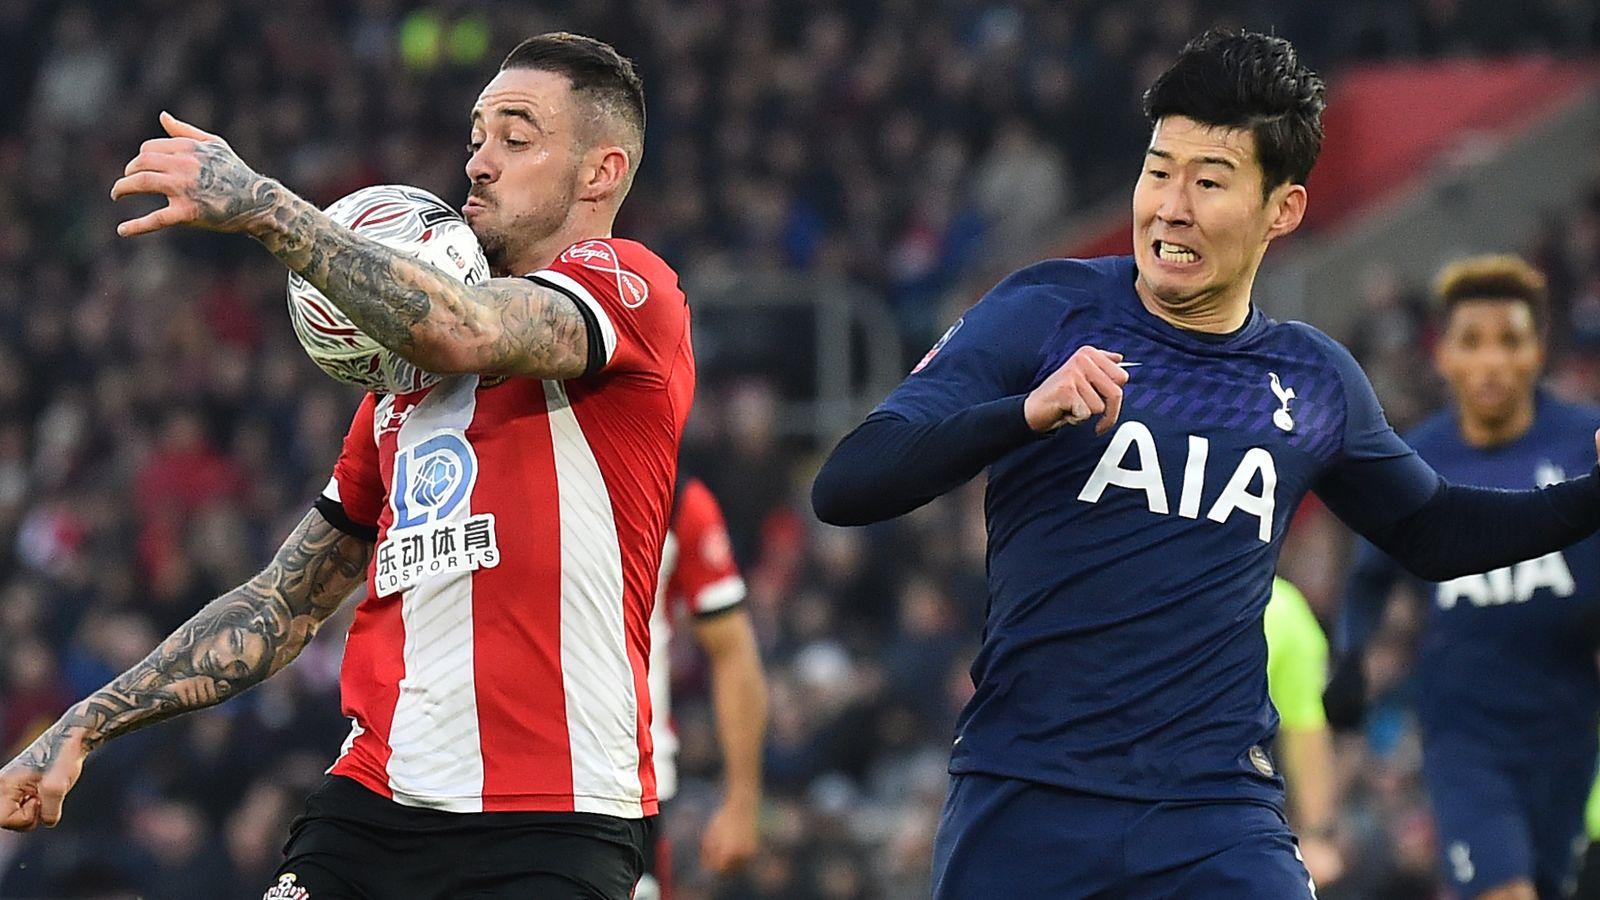 Southampton 1-1 Tottenham: Sofiane Boufal late equaliser earns Saints replay